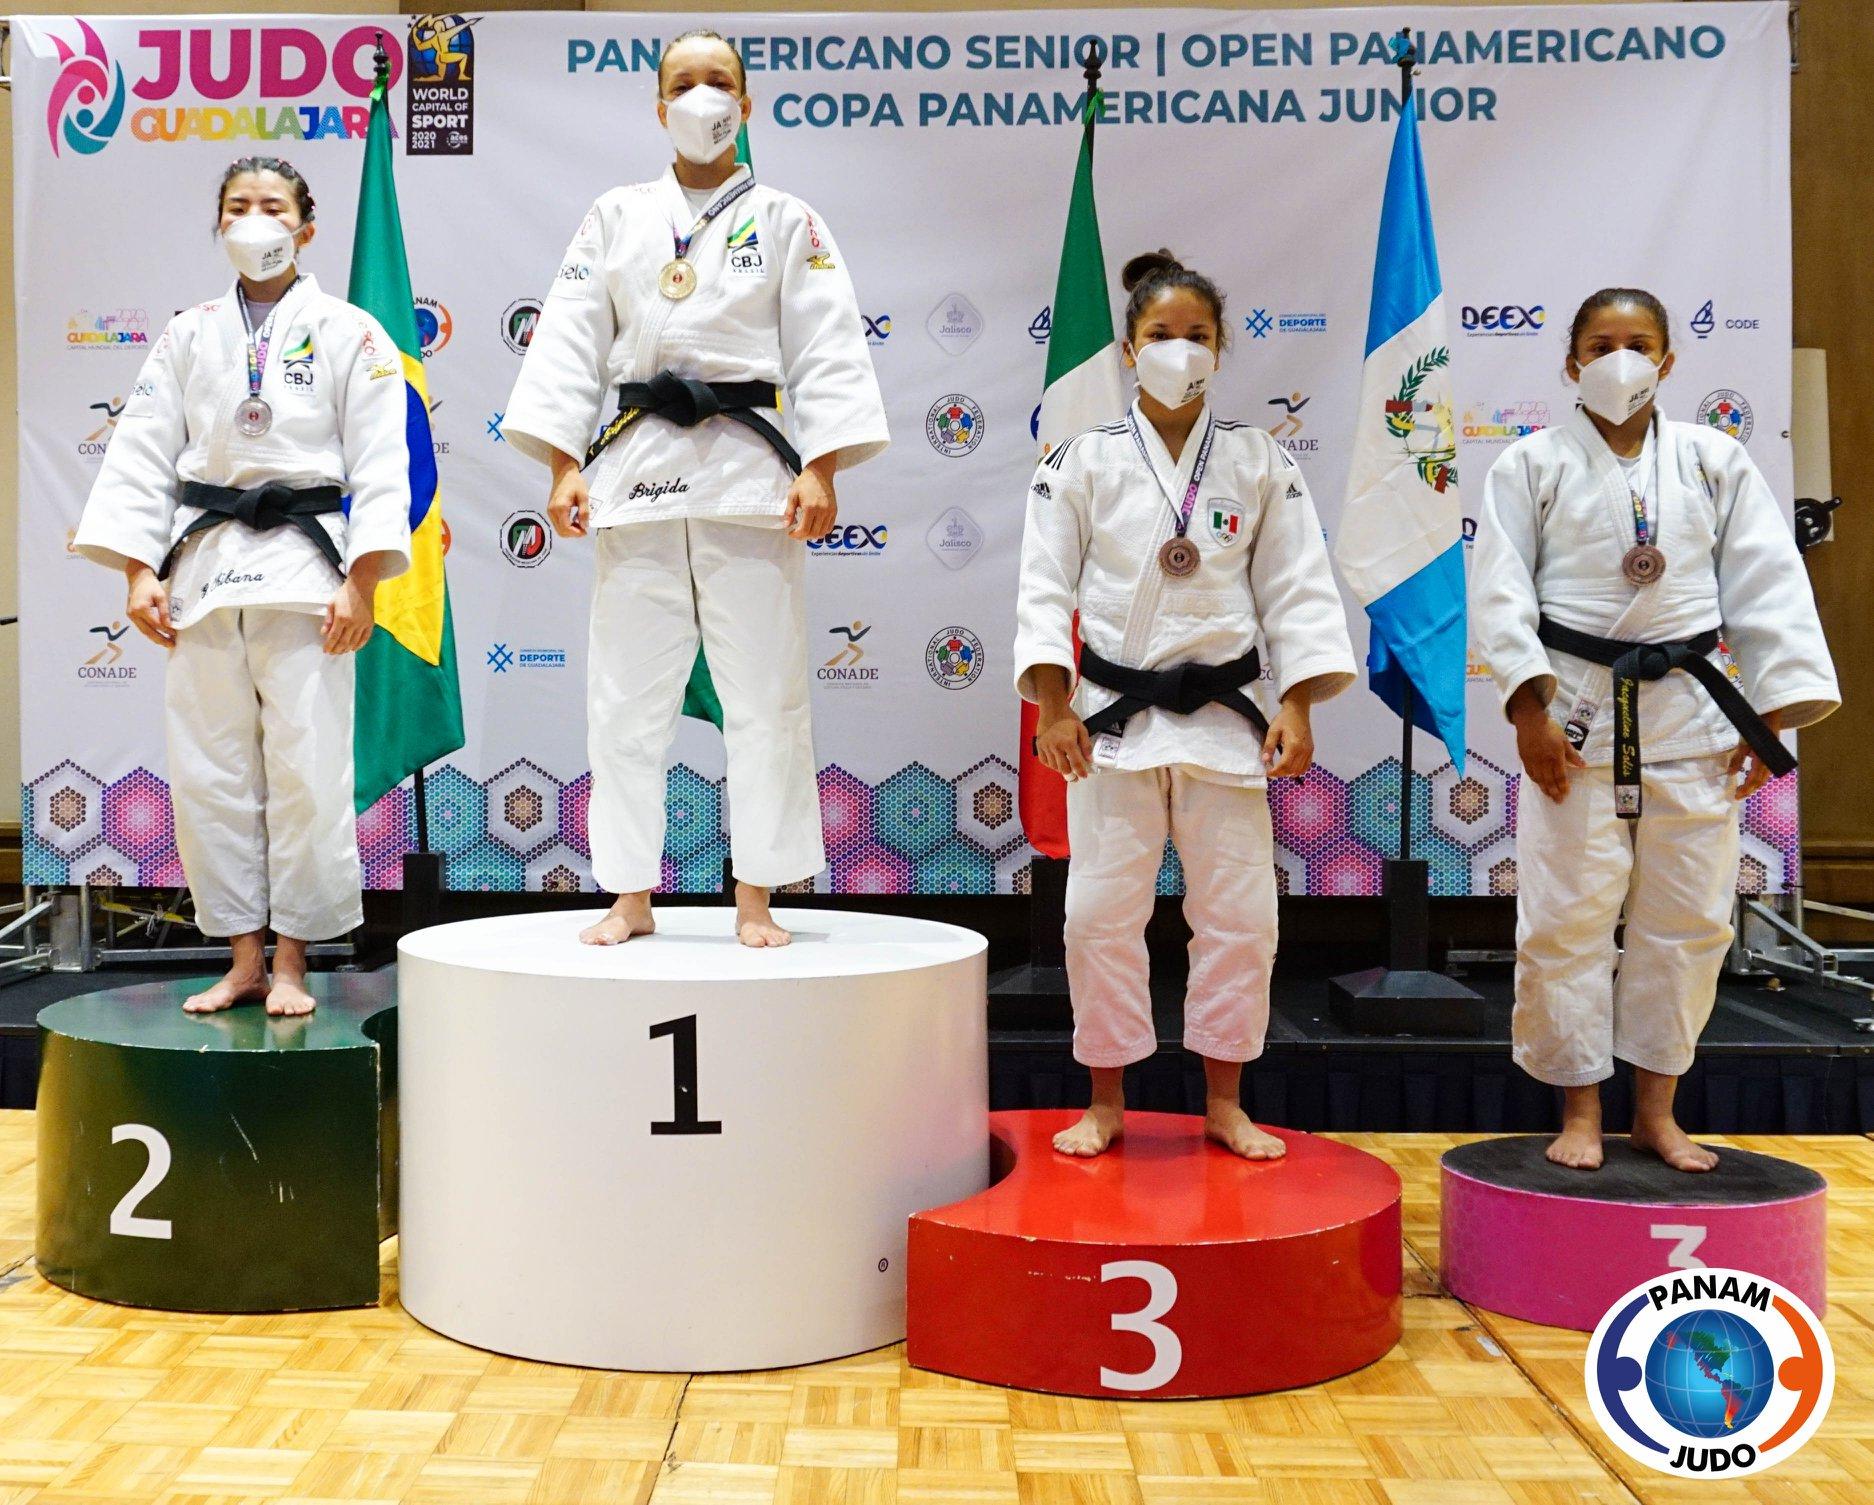 judô 2021 Divulgação Pan Americano de Guadalajara